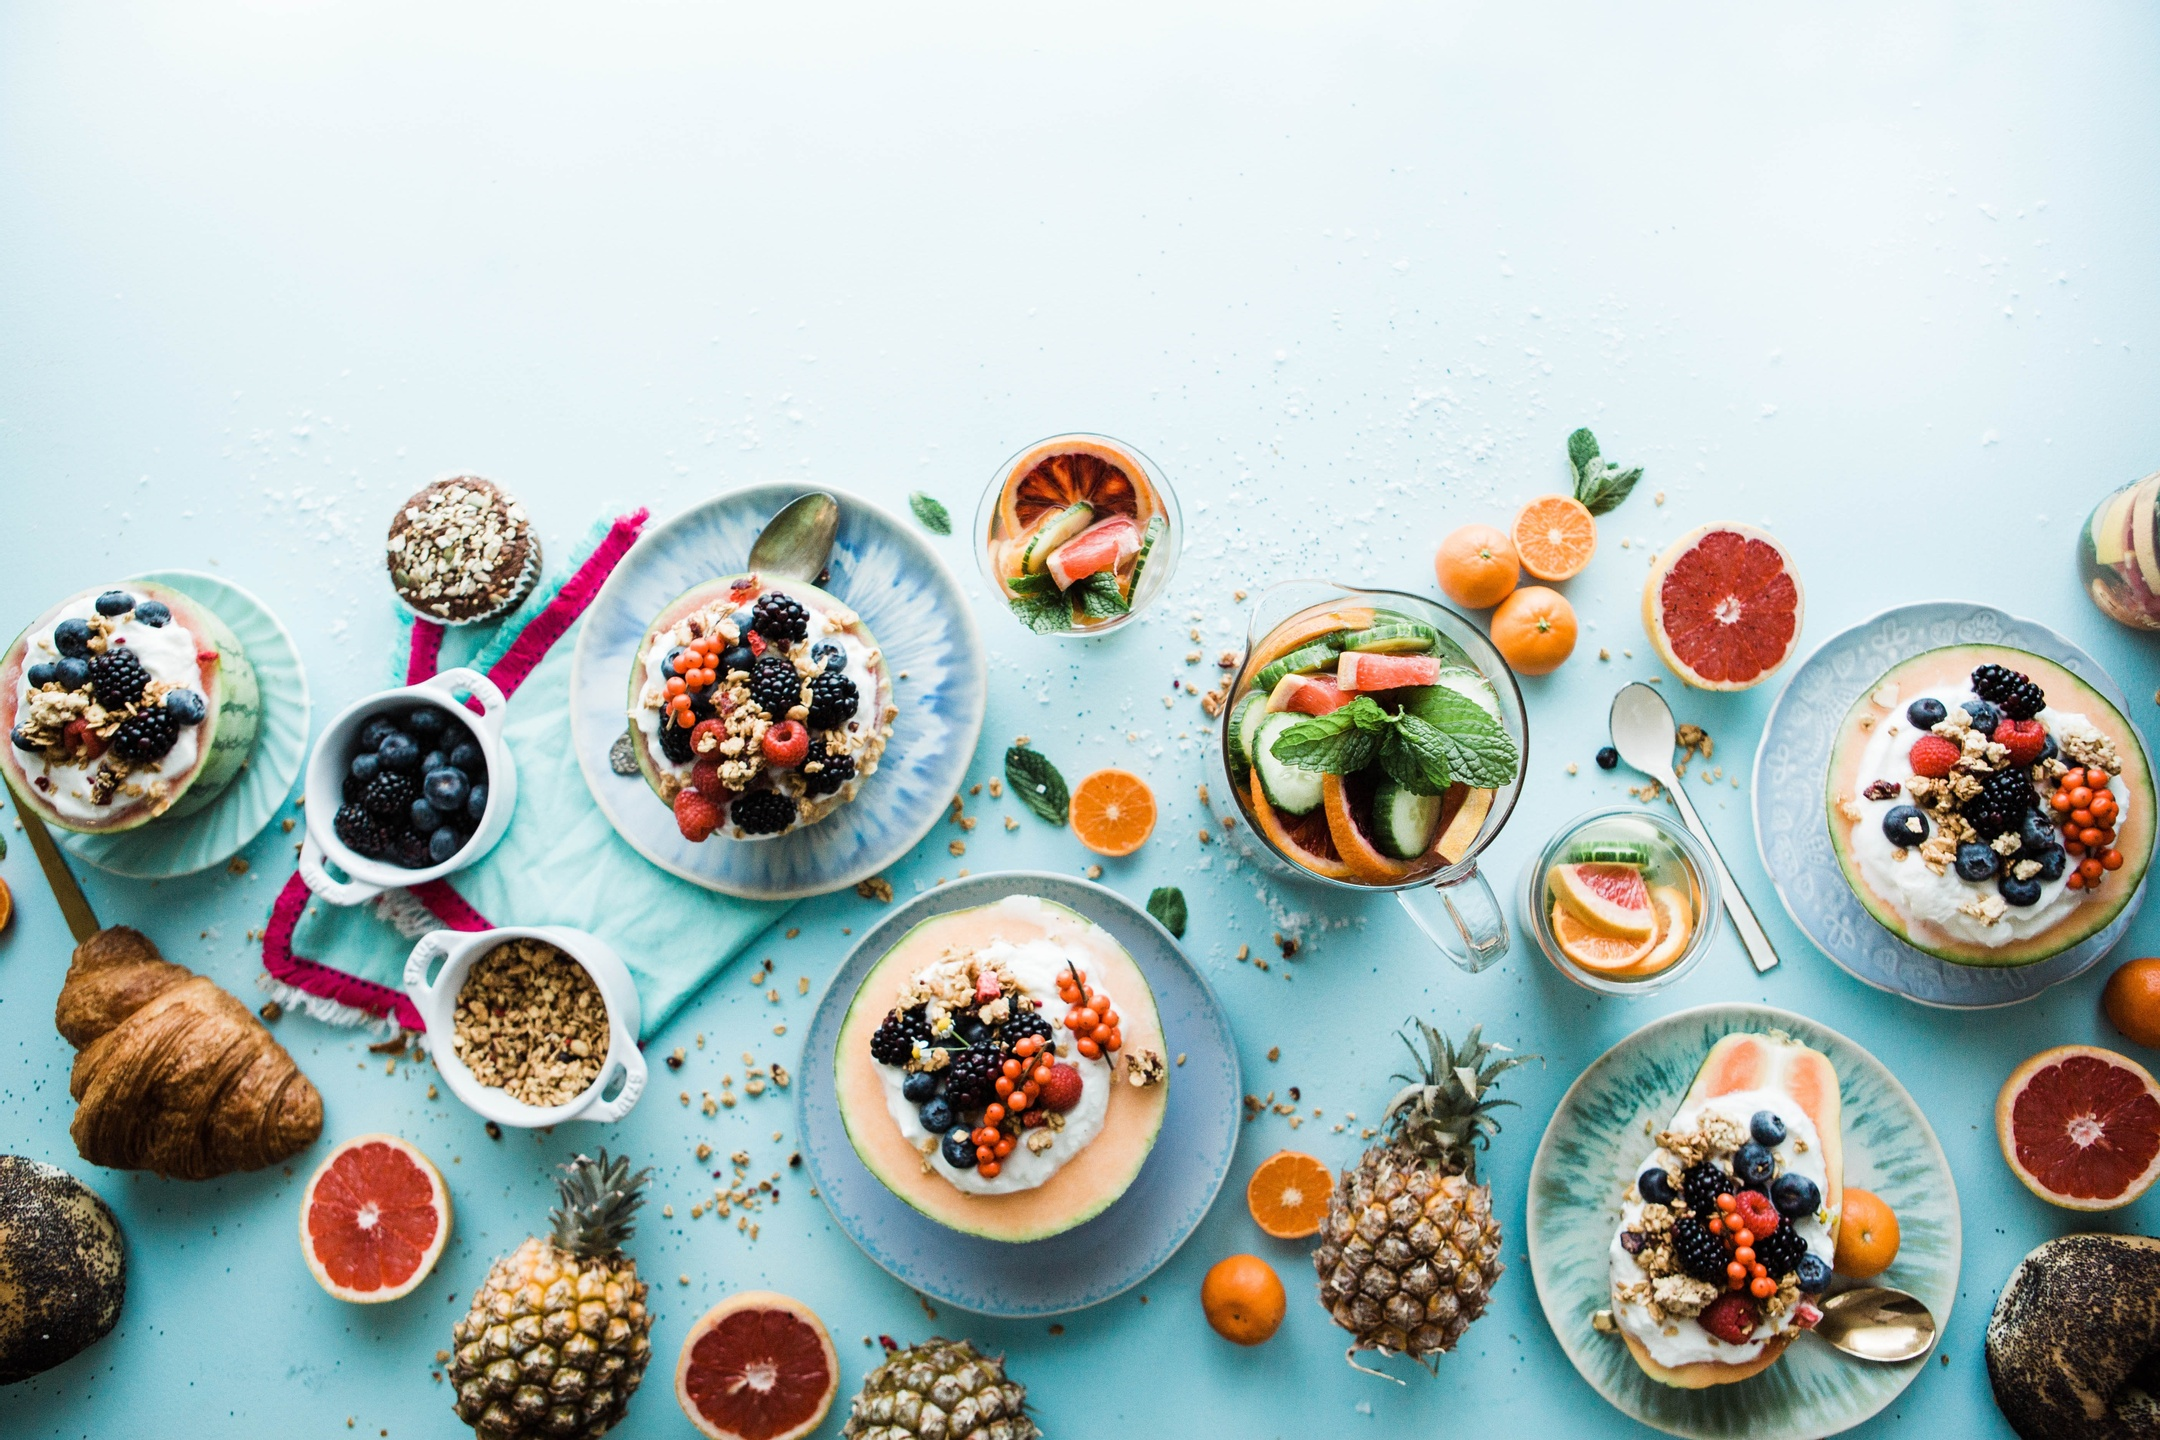 Dietitian Program NourishMNT